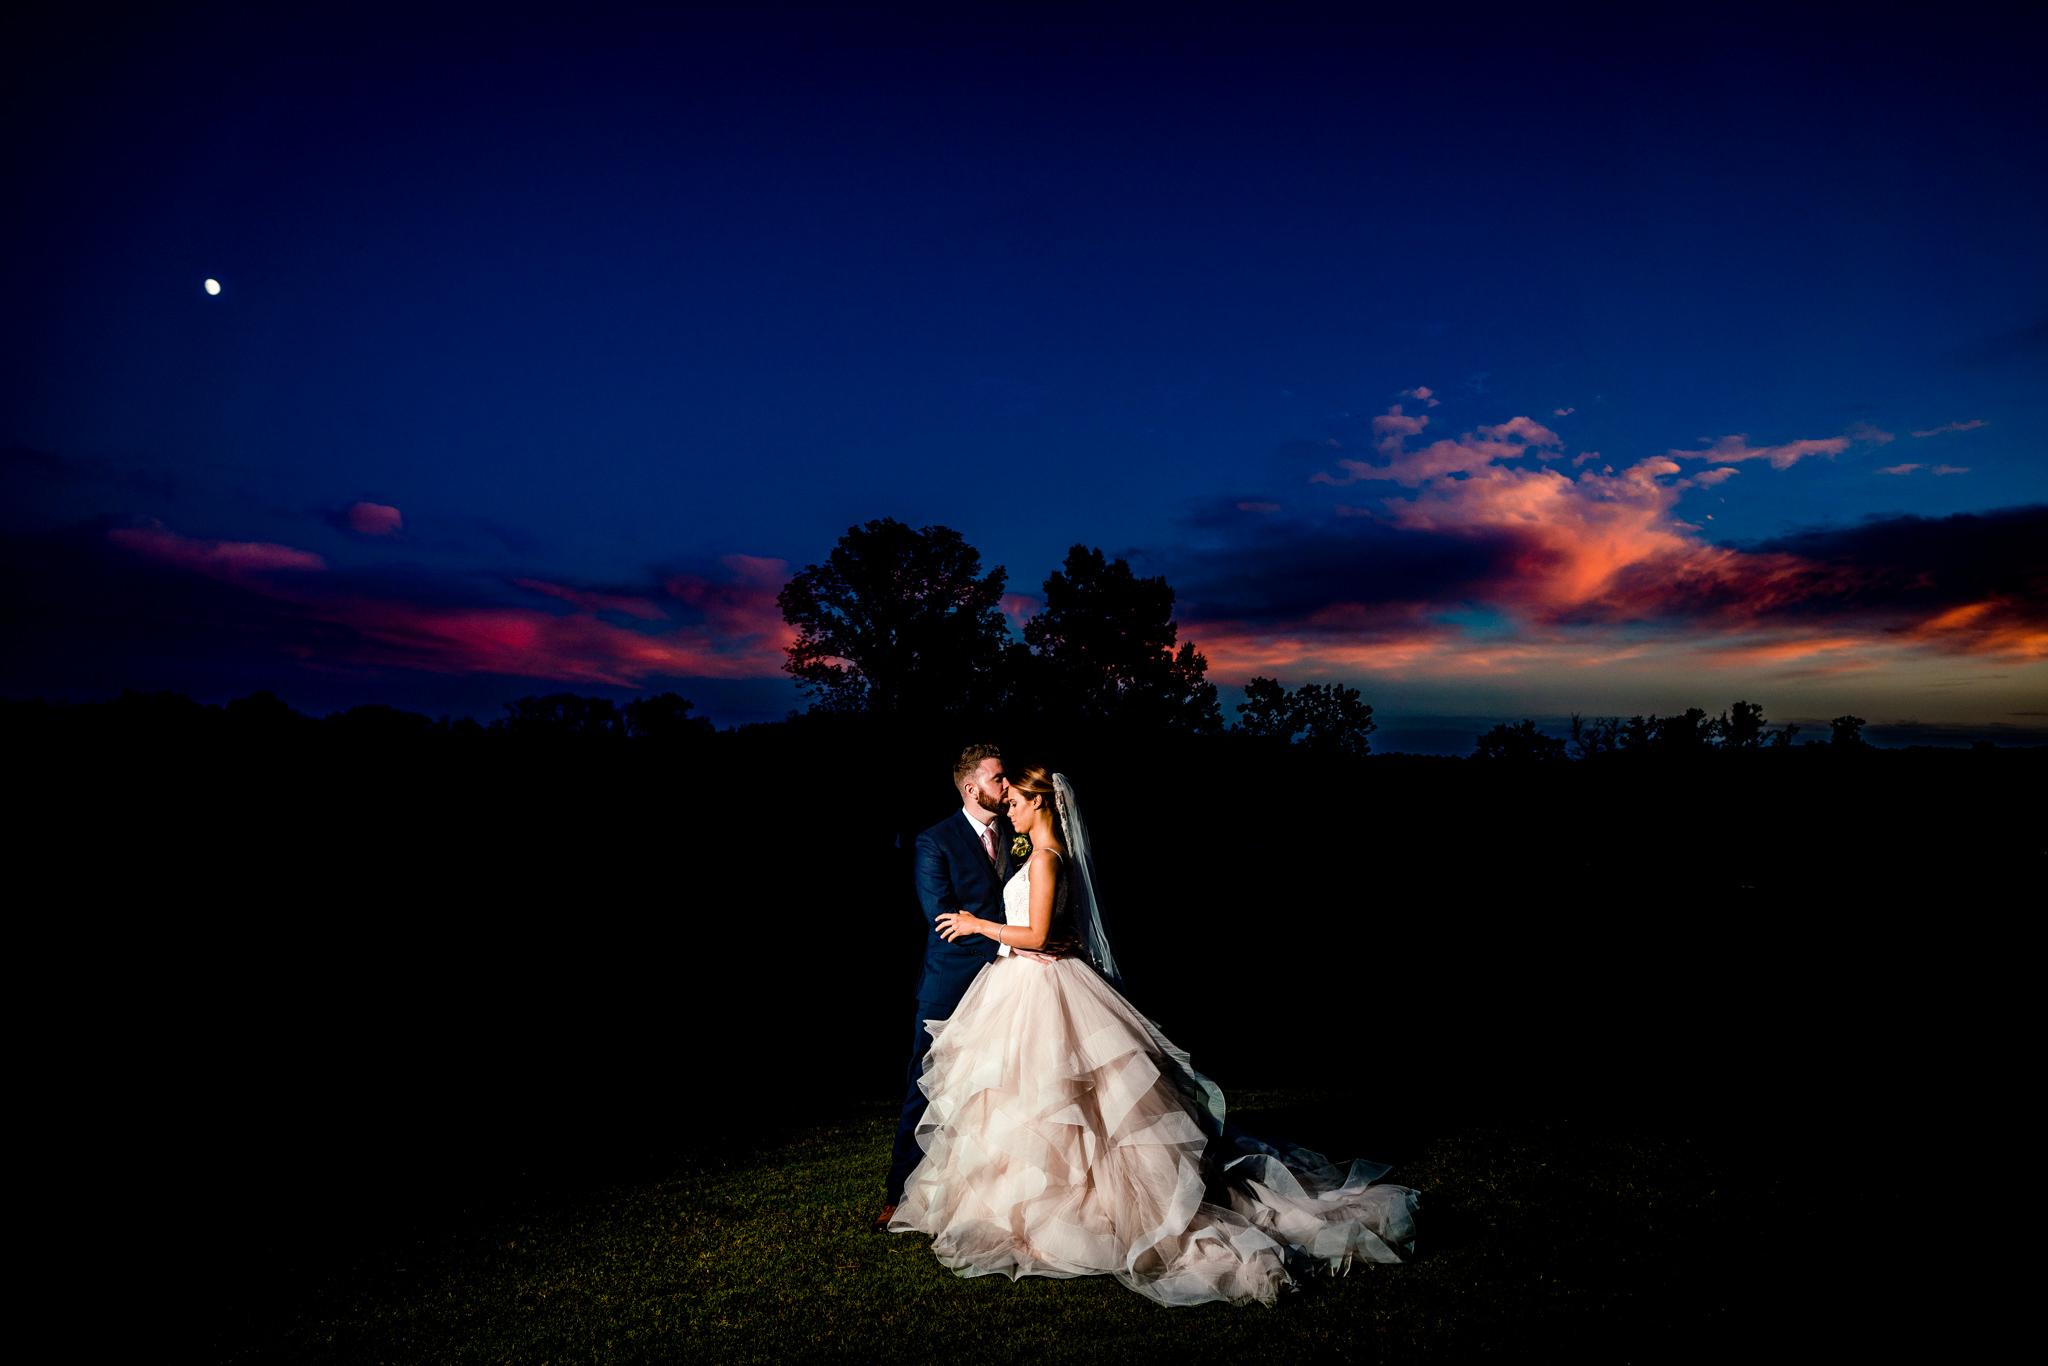 Emily&Ron-Chapel-hill-wedding-barn-77.jpg